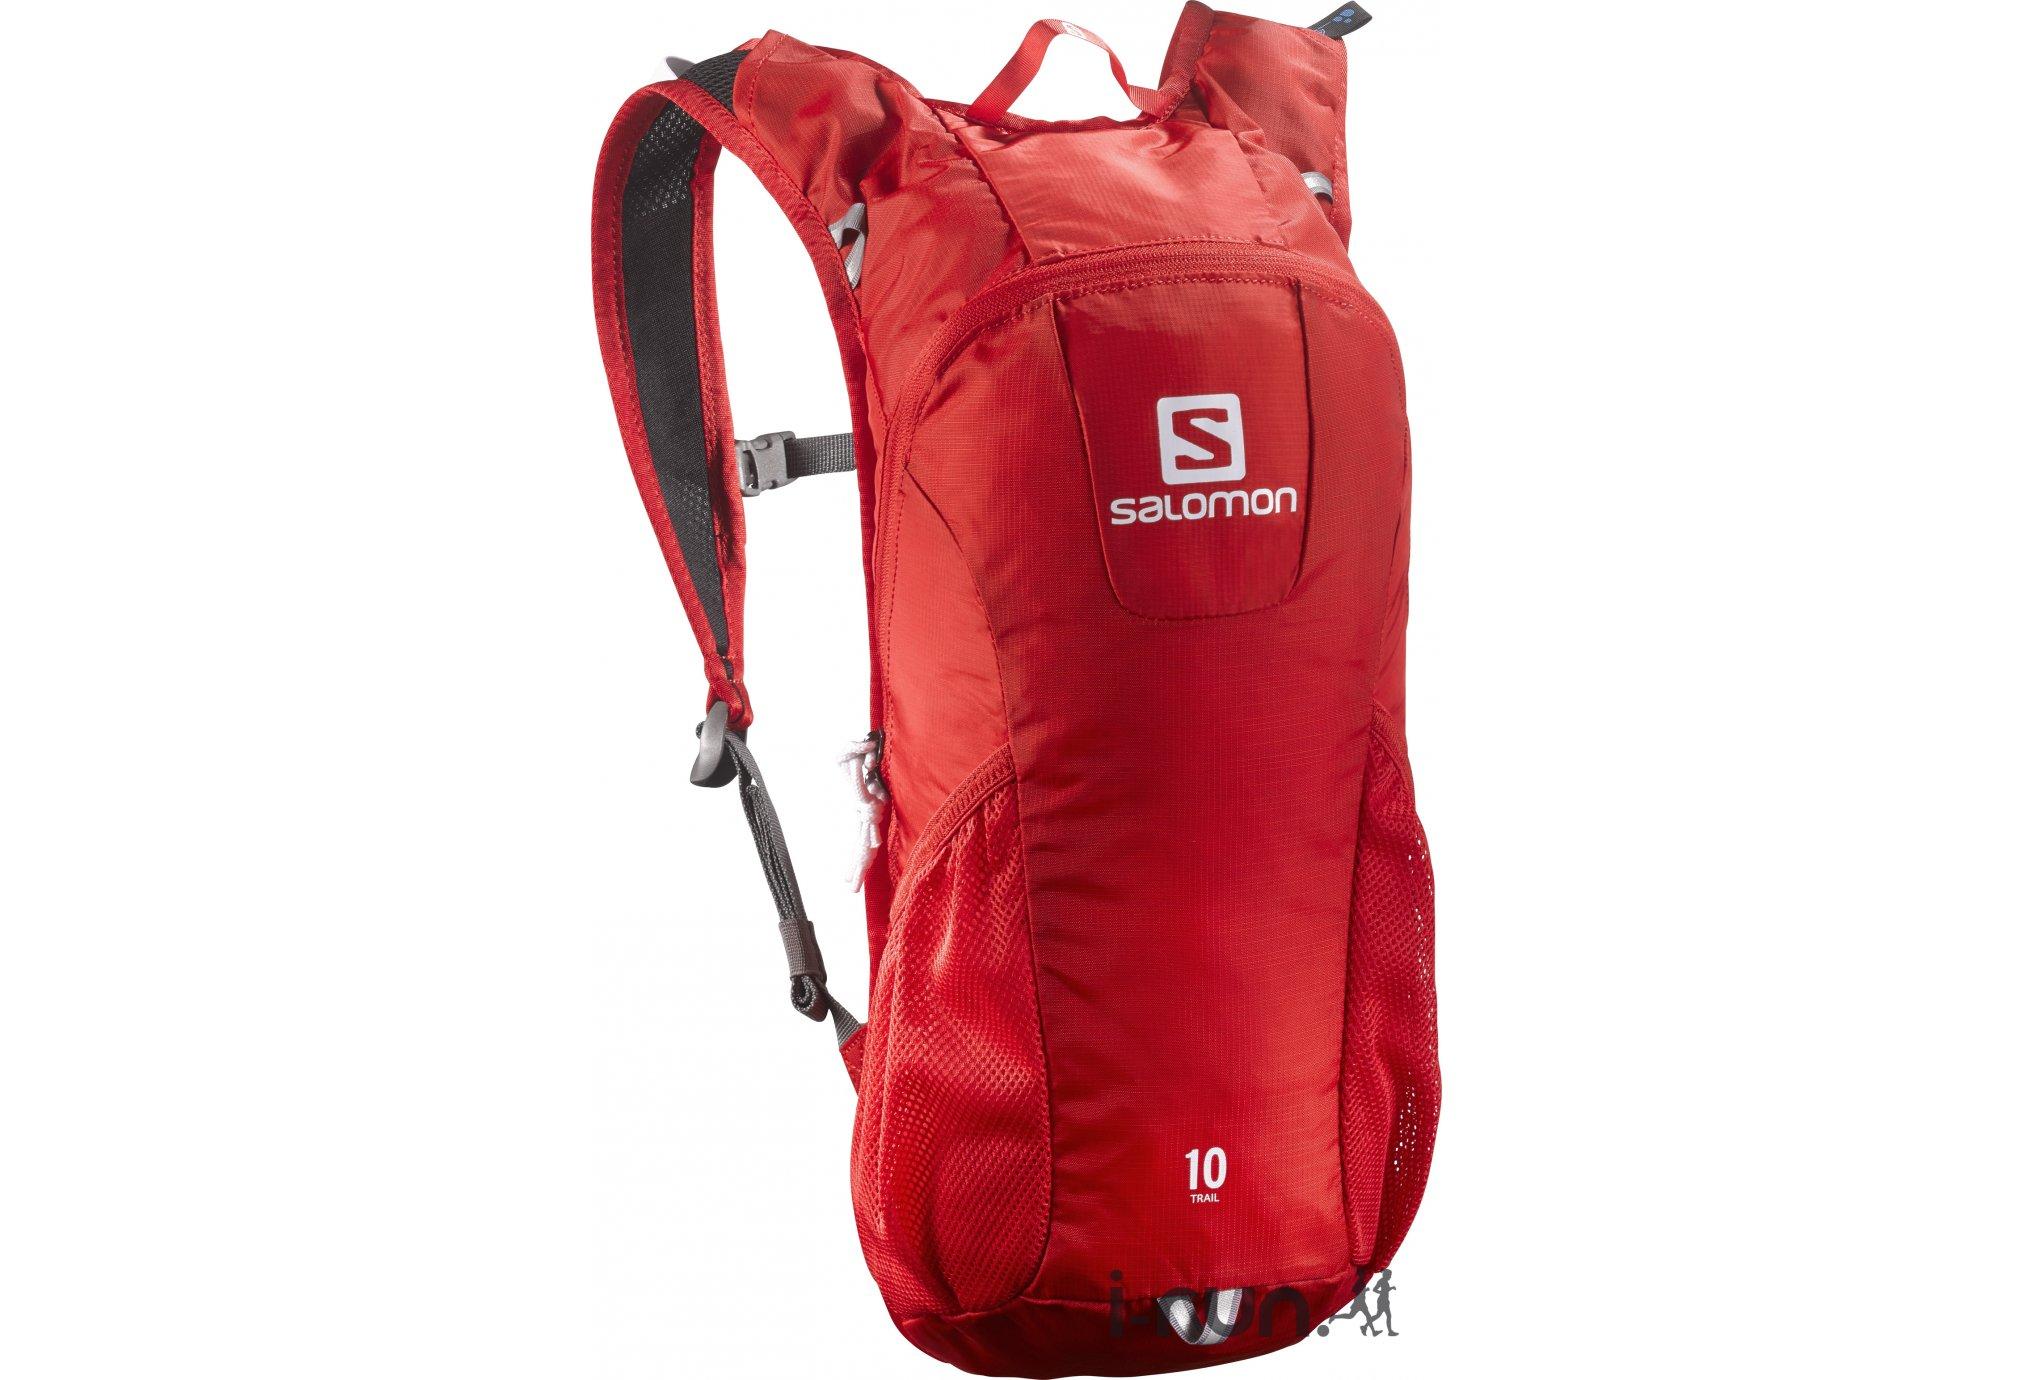 Salomon Sac à Dos Trail 10 Sac hydratation / Gourde